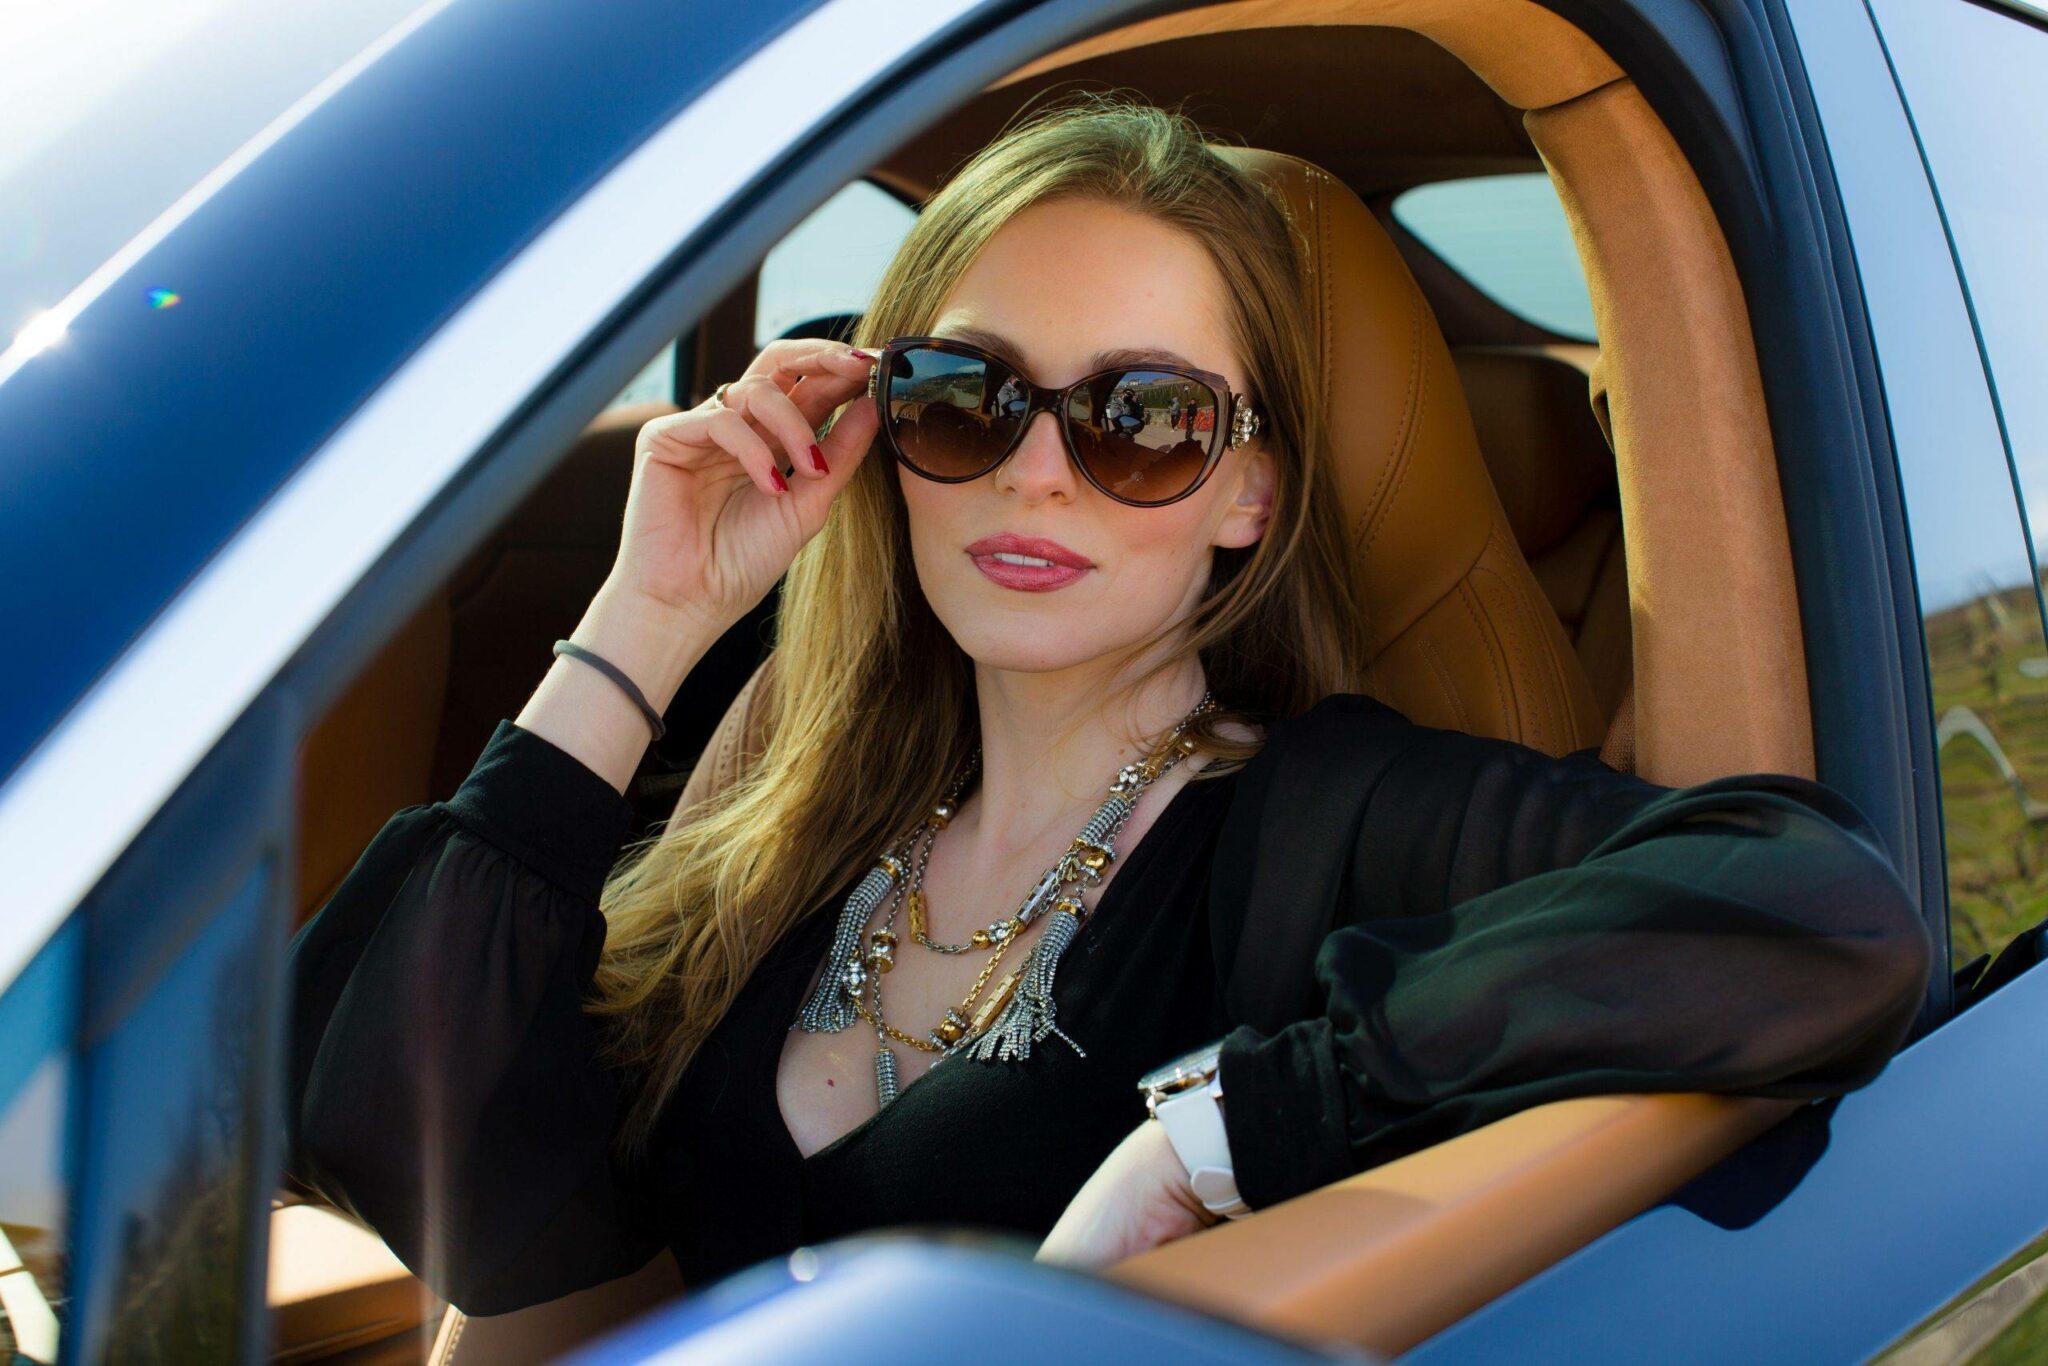 Izabela Switon-Kulinska @bella_zofia is sitting in Aston Martin DBX car in Geneva.